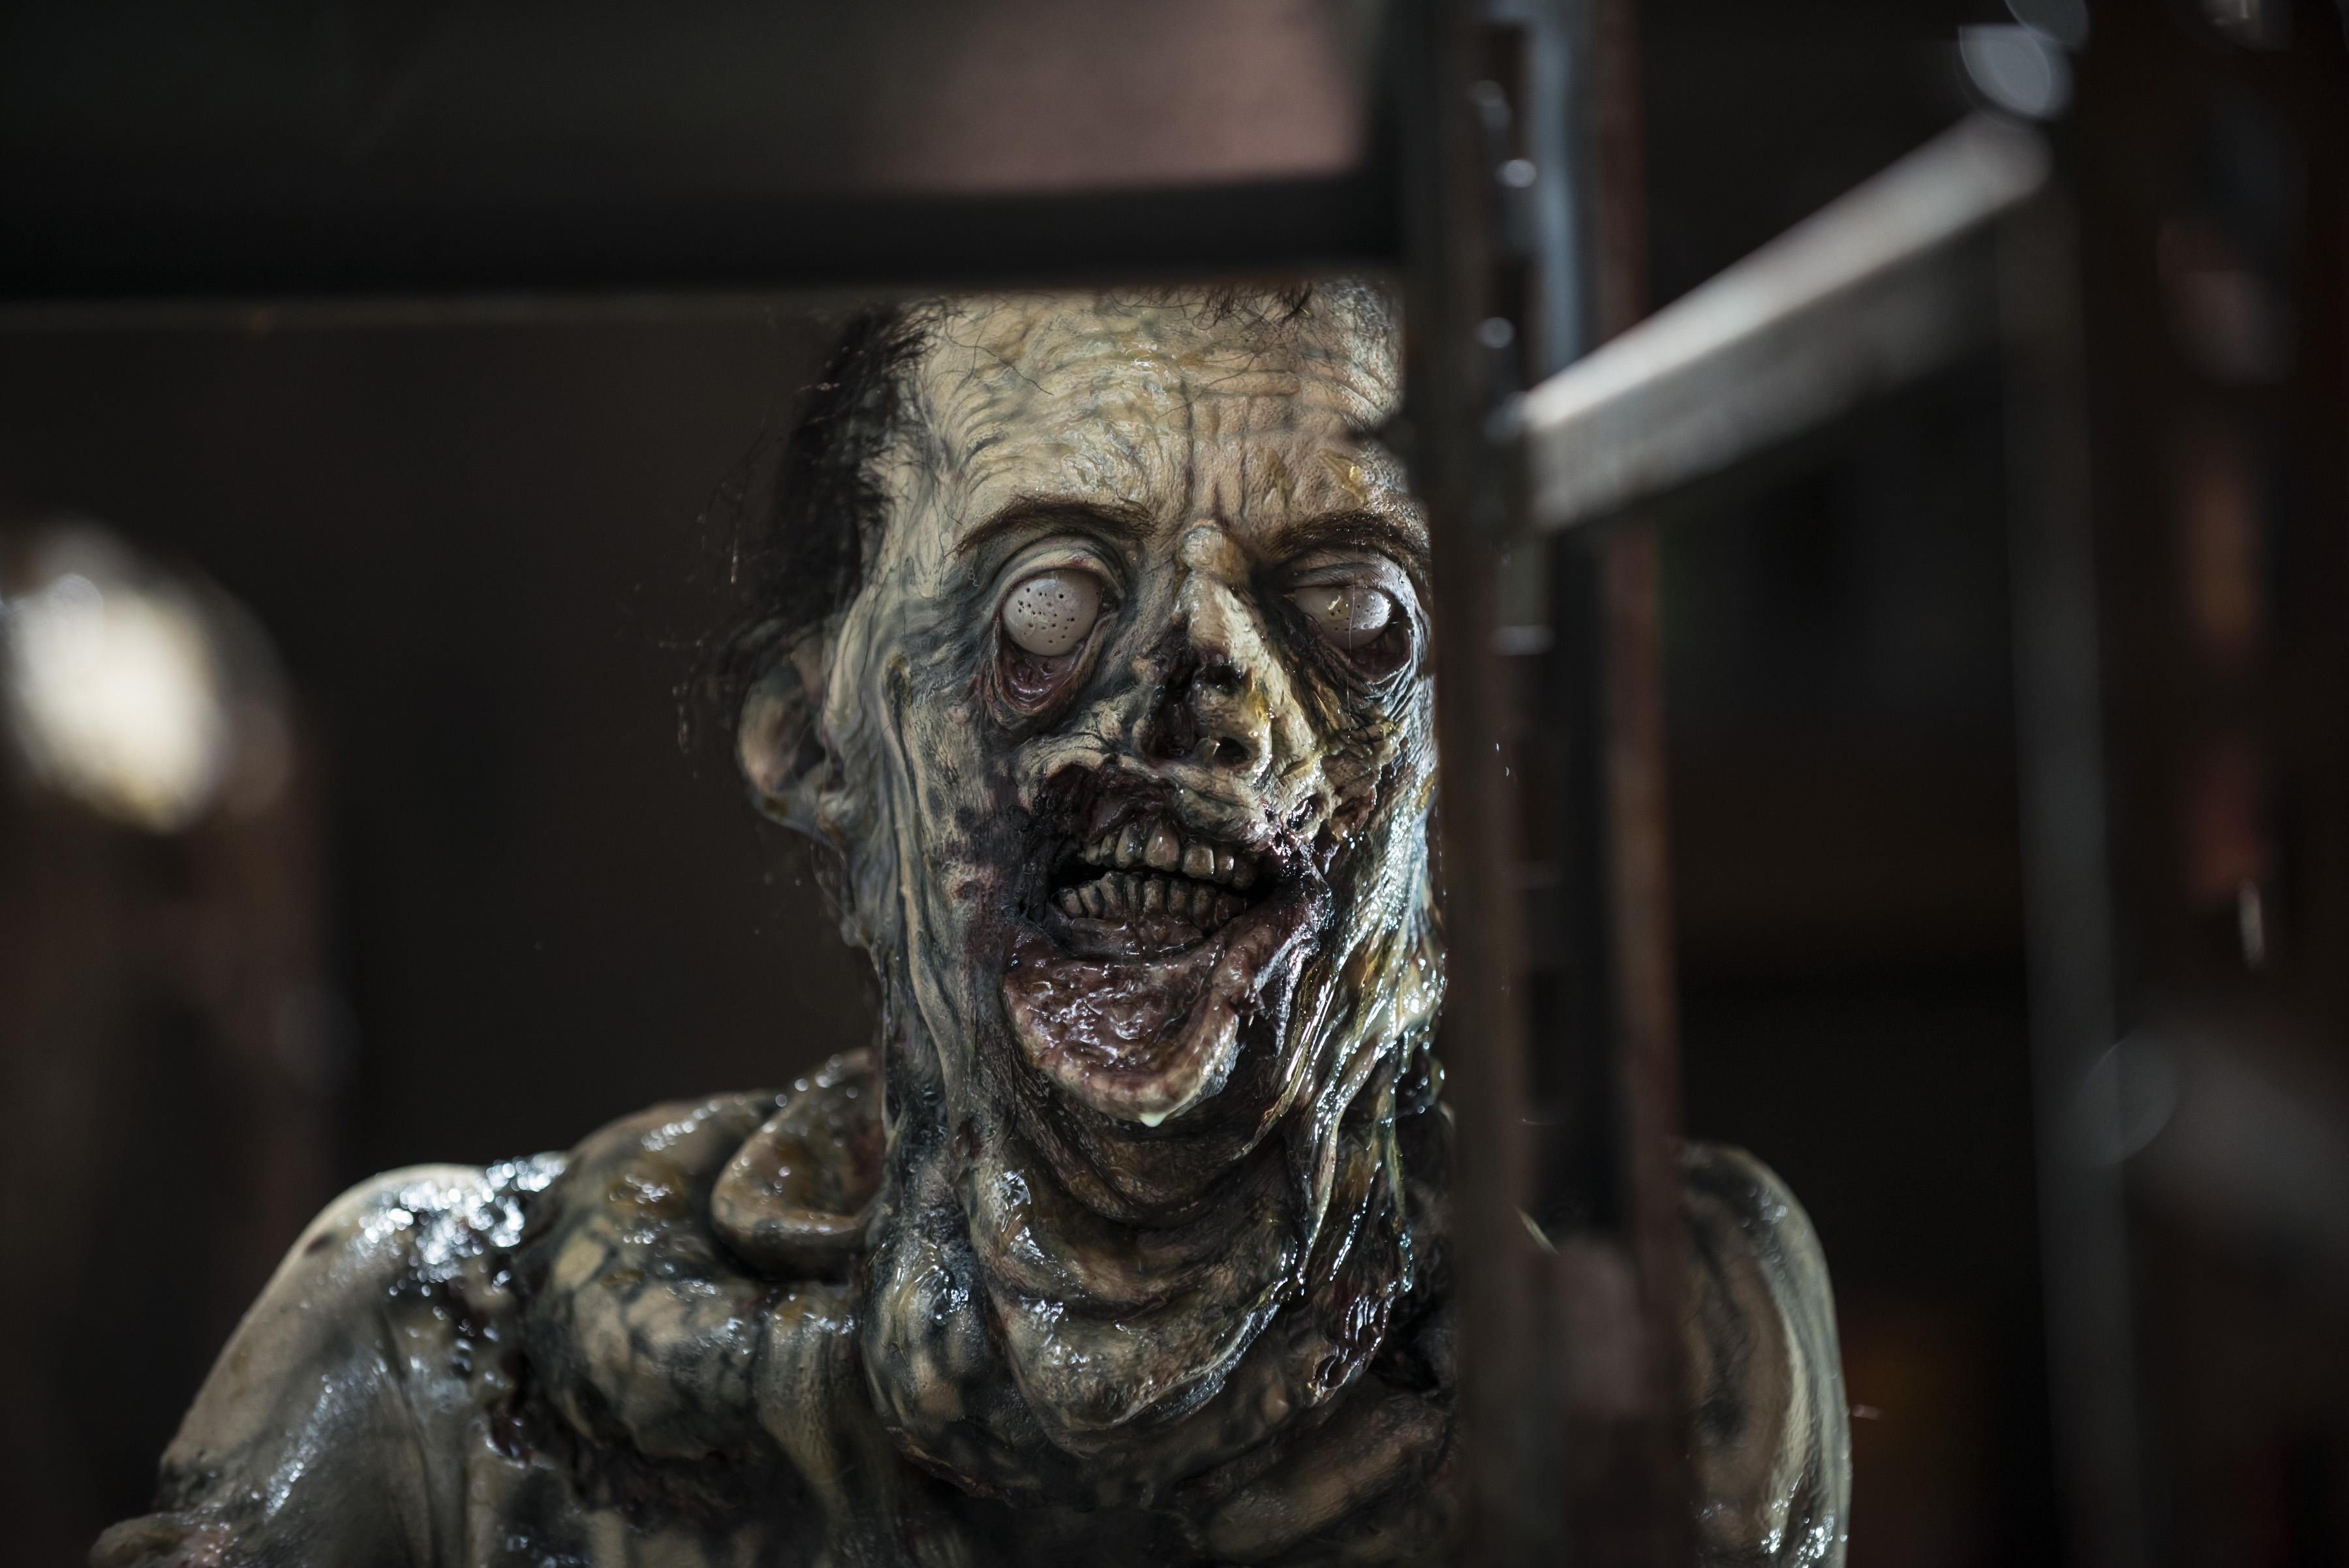 Already far Walking dead zombies valuable information